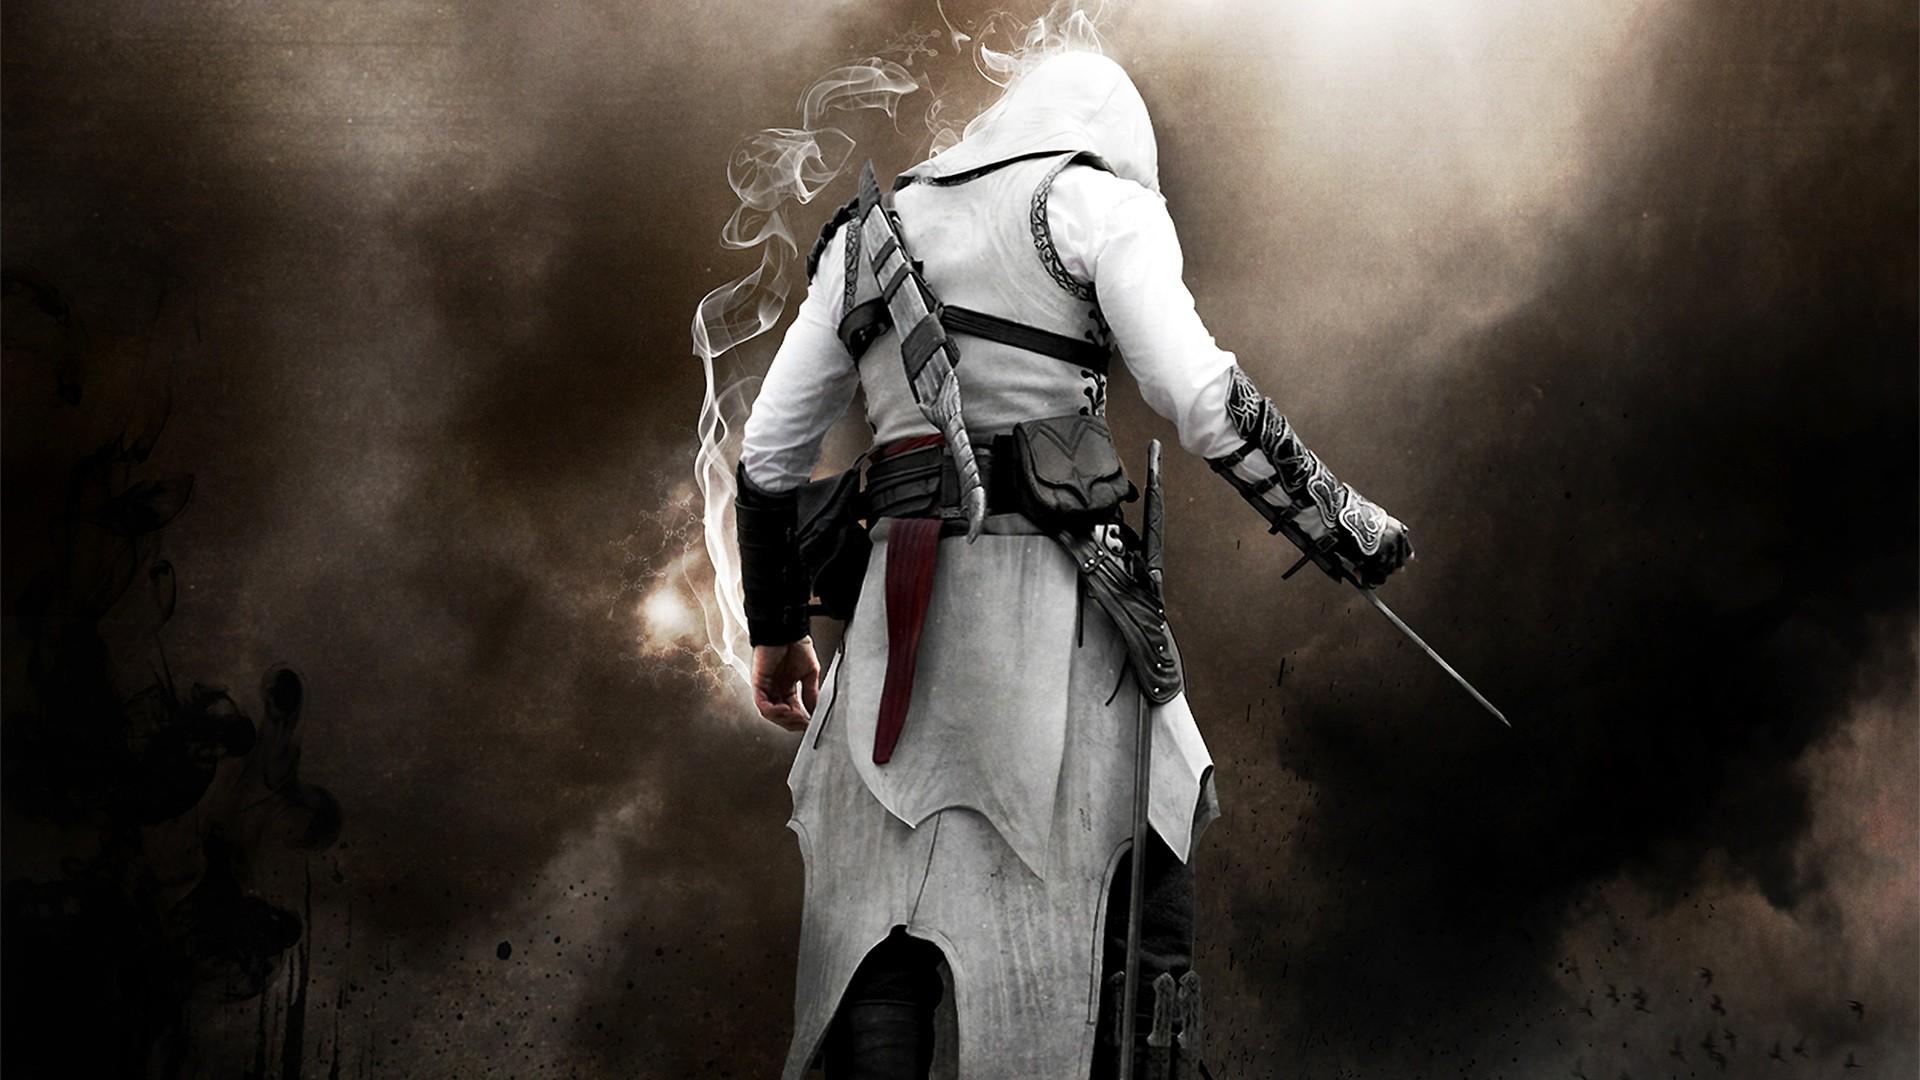 Assassins Creed assassins creed game gray knife smoke 1920x1080